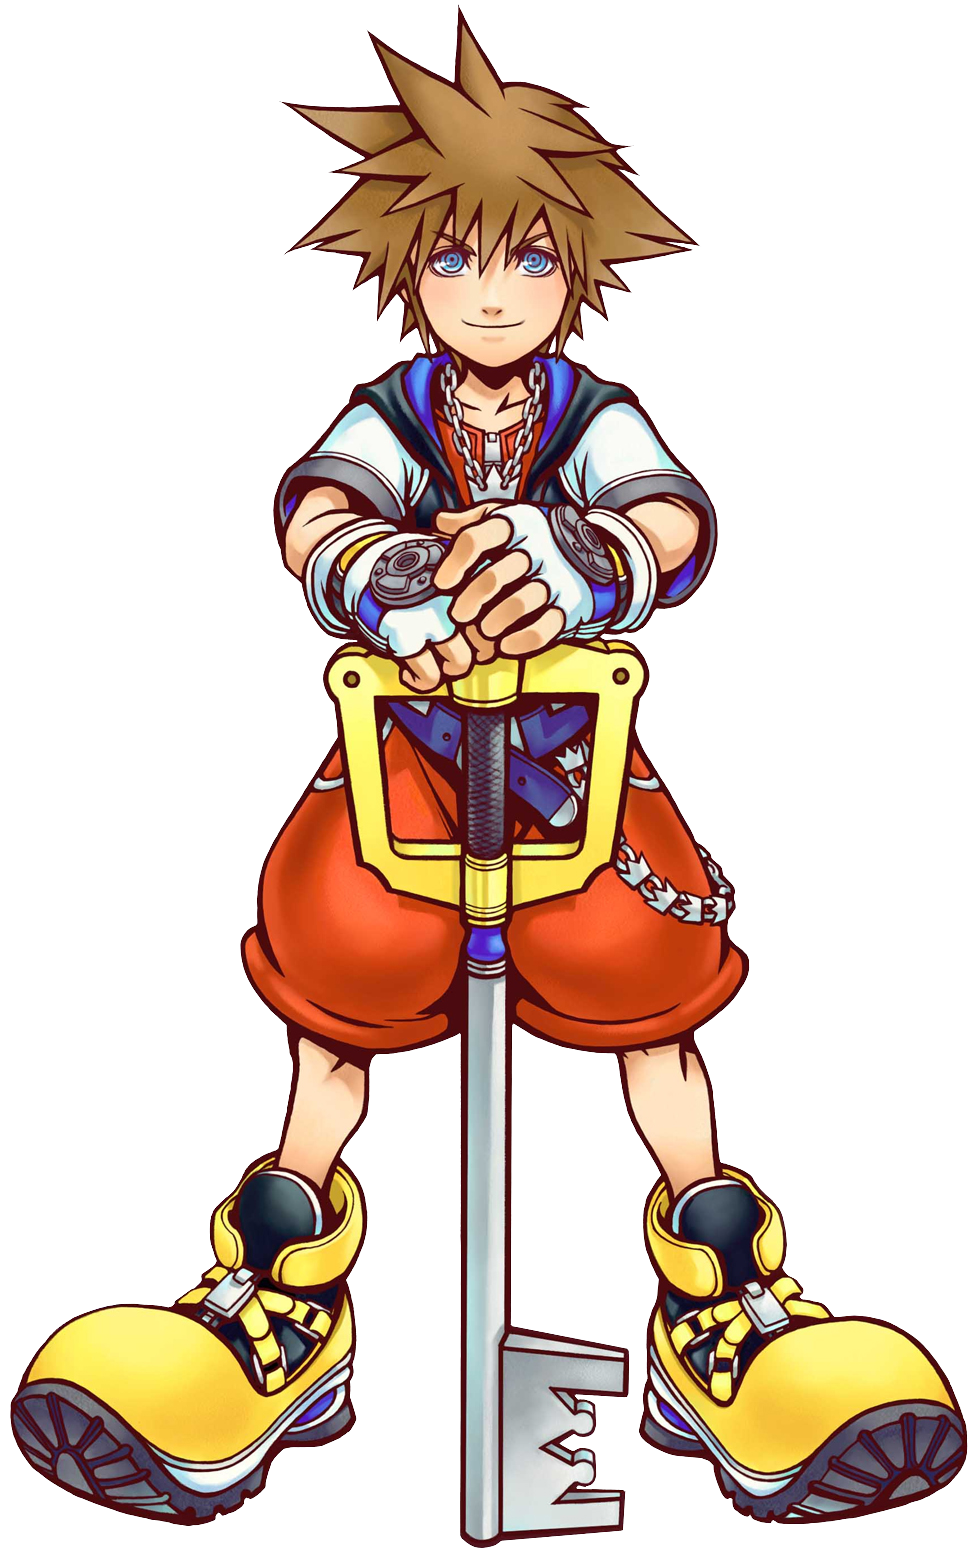 latest (974×1552) | Kingdom Hearts <3 | Pinterest | Heart, Art and ...